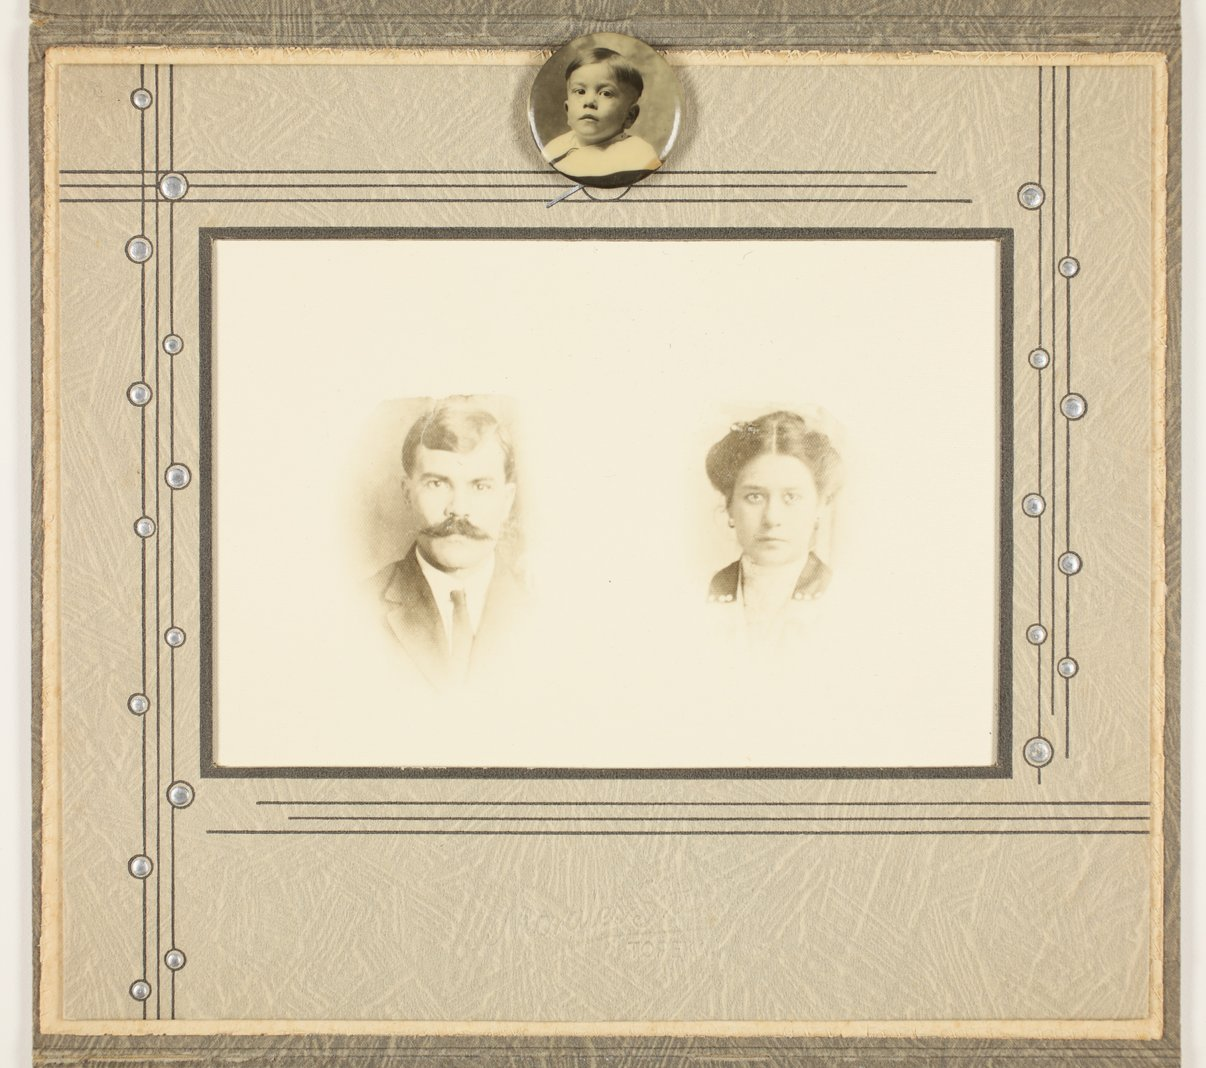 Jose and Angelina Alcala and their son Abel, Topeka, Kansas